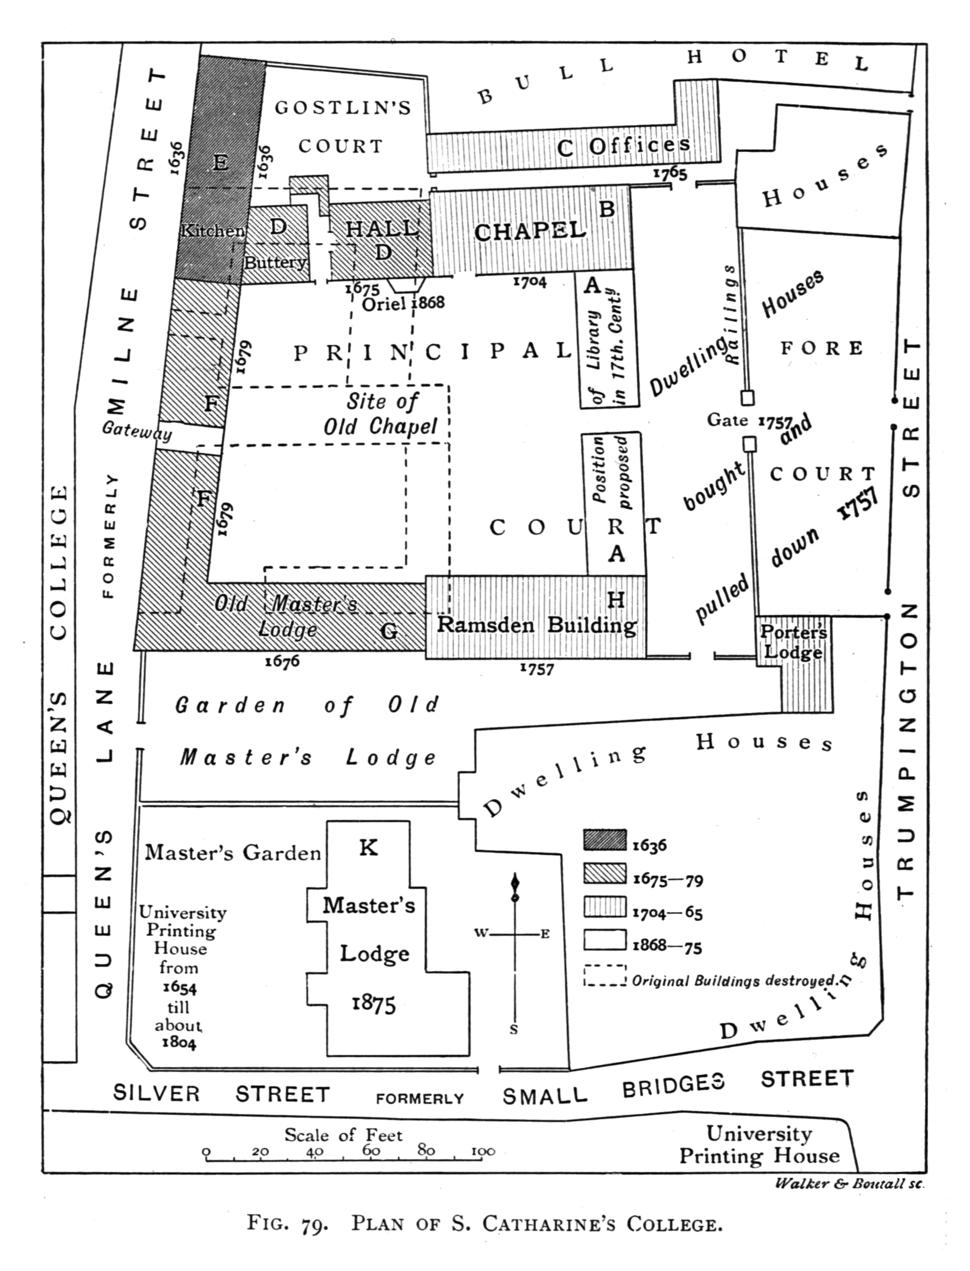 Historical plan of St Catharine's College, Cambridge (1897) - cambridgedescri00atkiuoft 0498